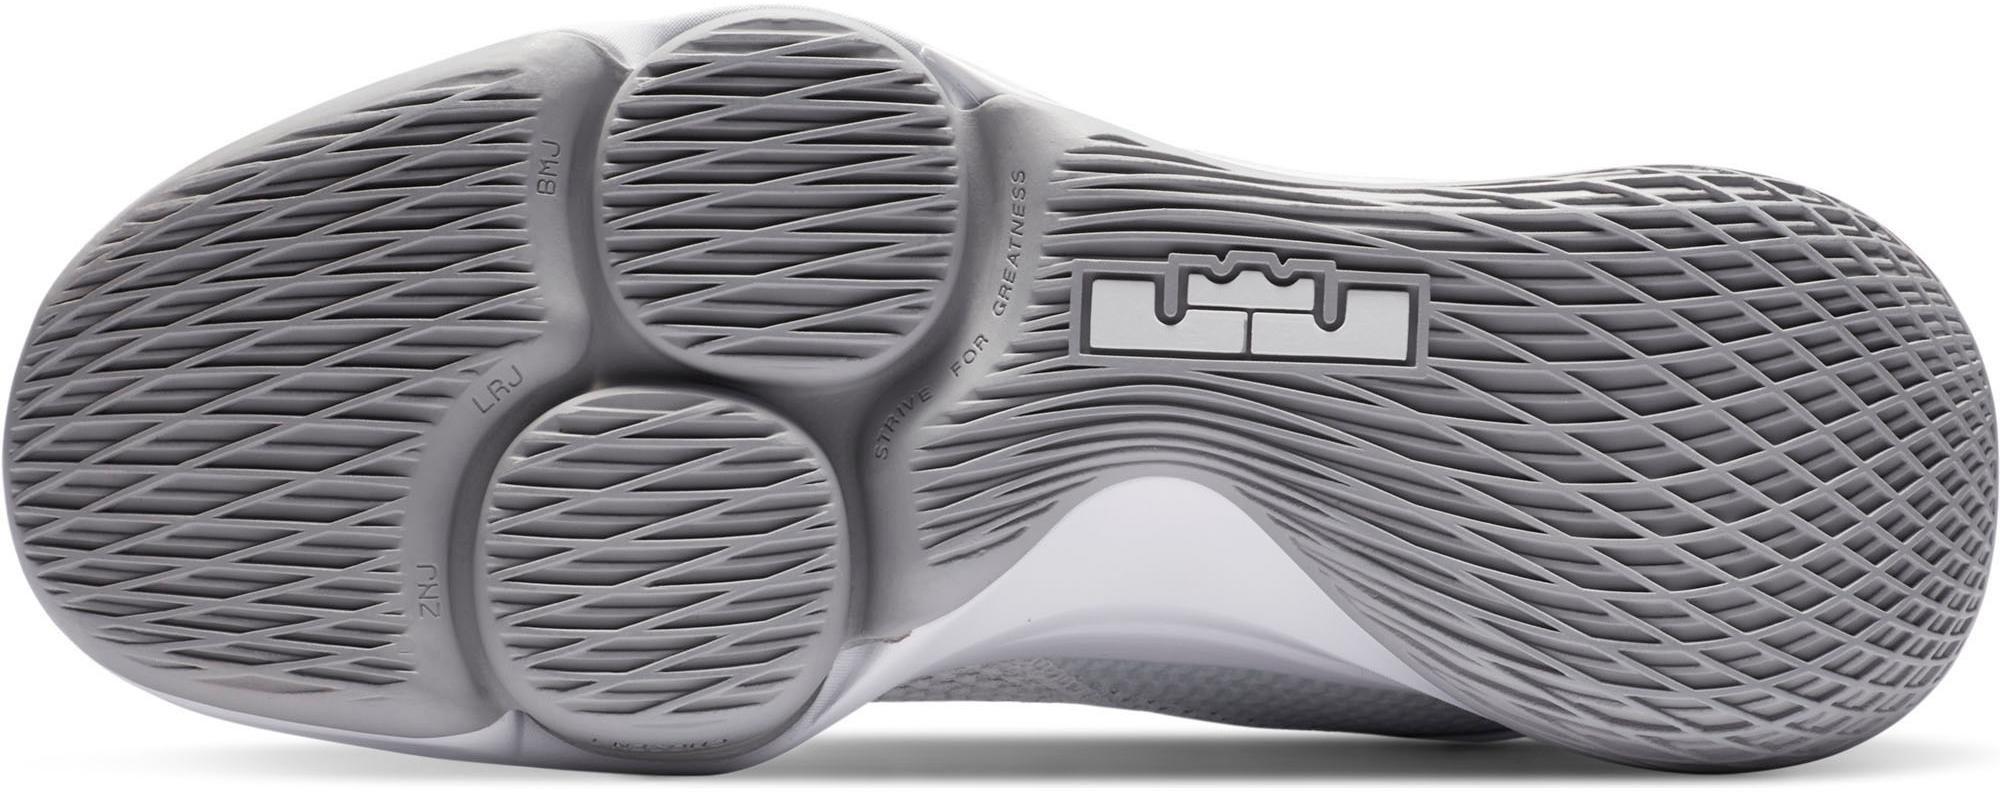 Nike basketbalschoenen »Lebron Witness Iv (Team)« bij OTTO online kopen